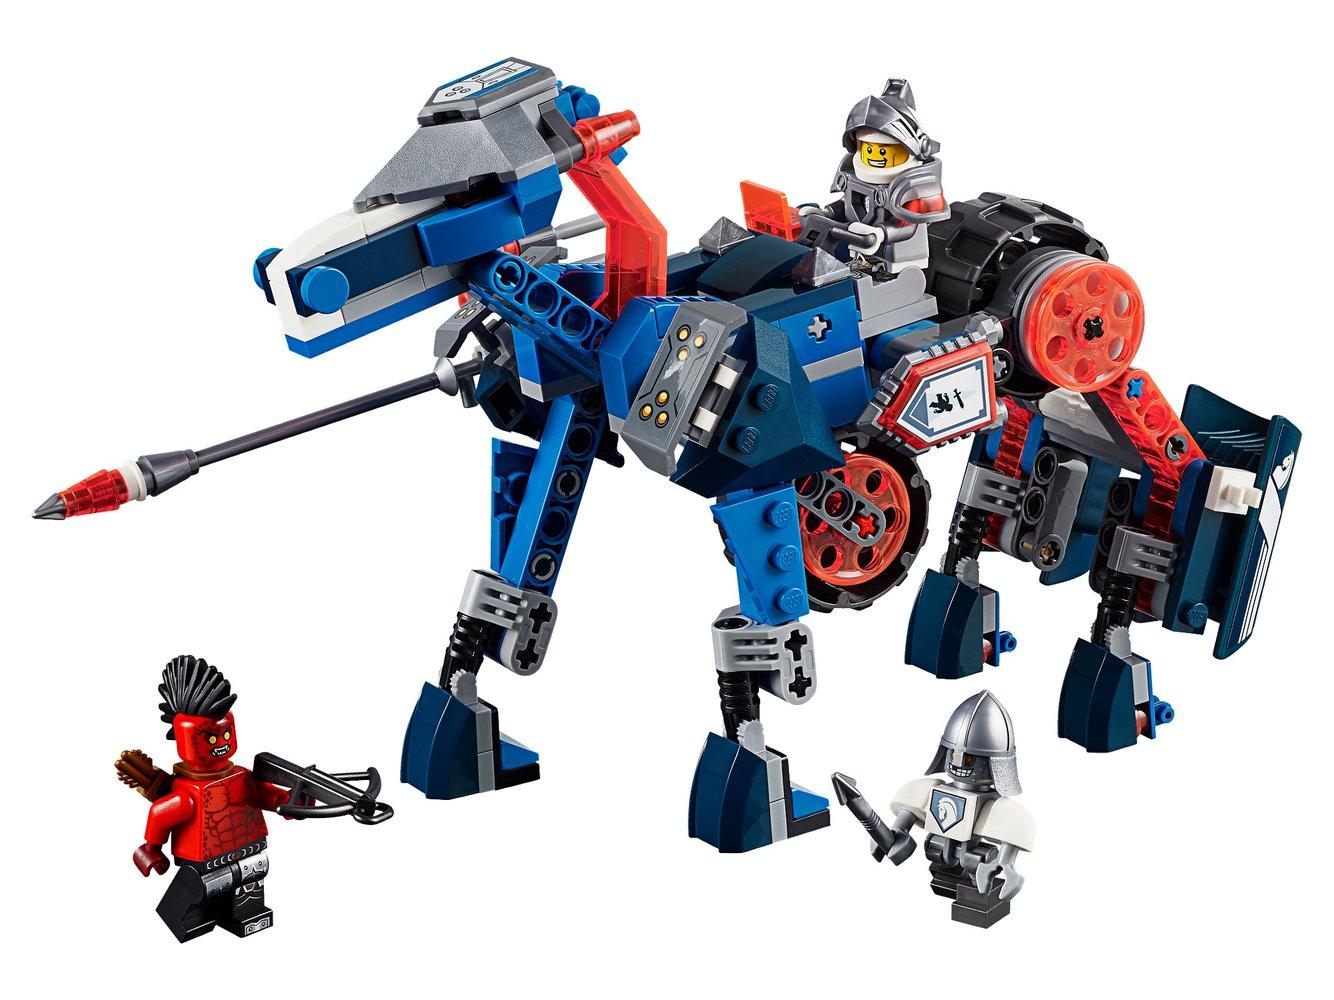 Lance's Mecha Horse